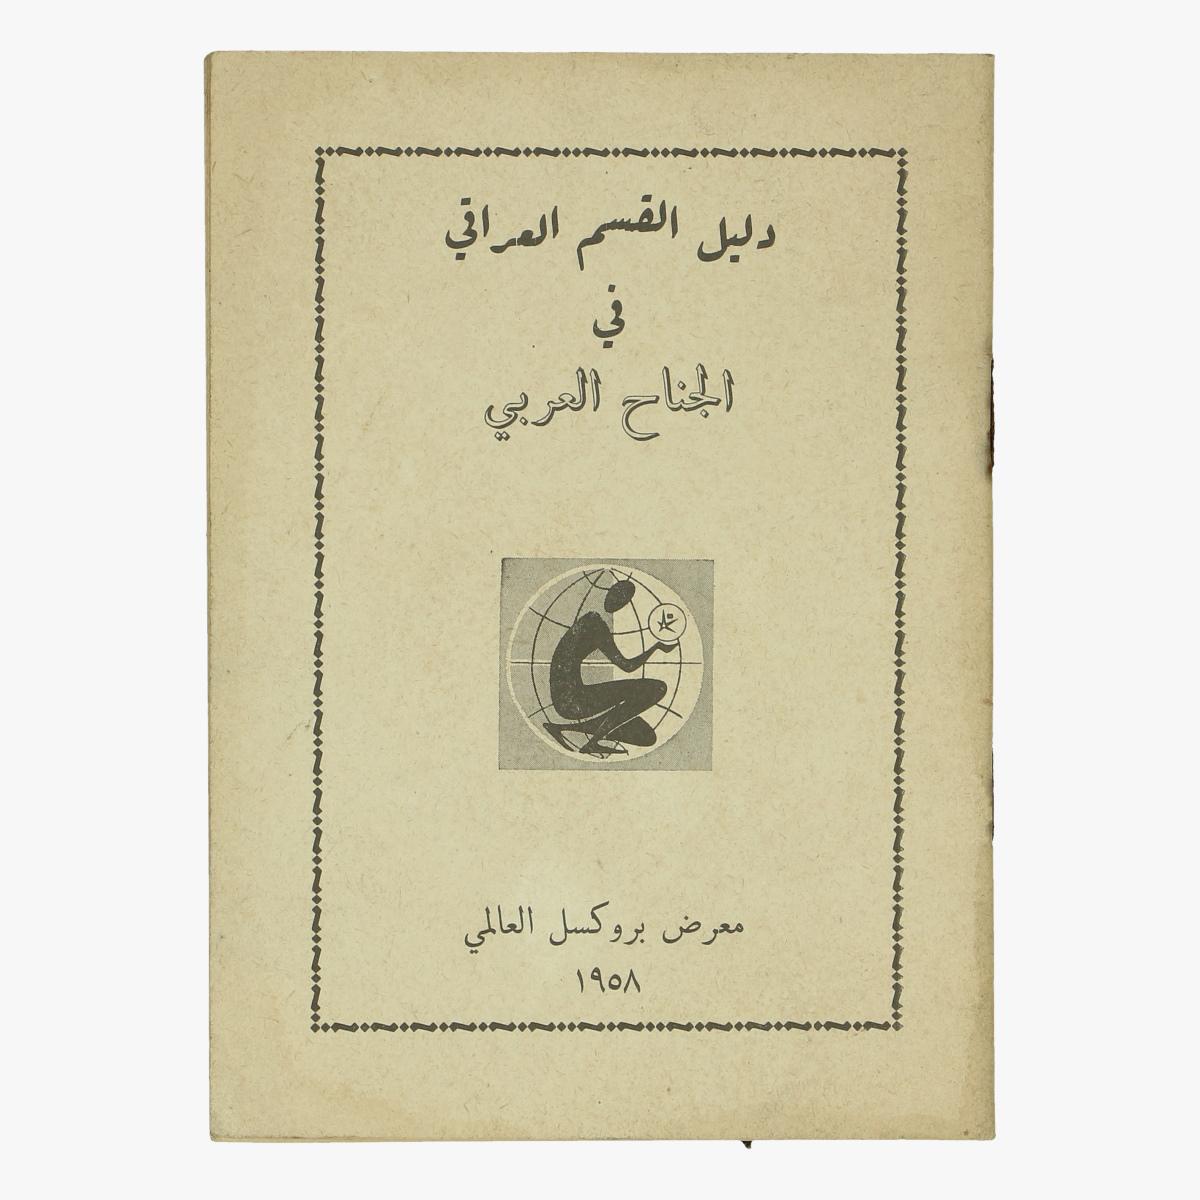 Afbeeldingen van expo 58 guide du stand l' Irak pavillon de etats arabes